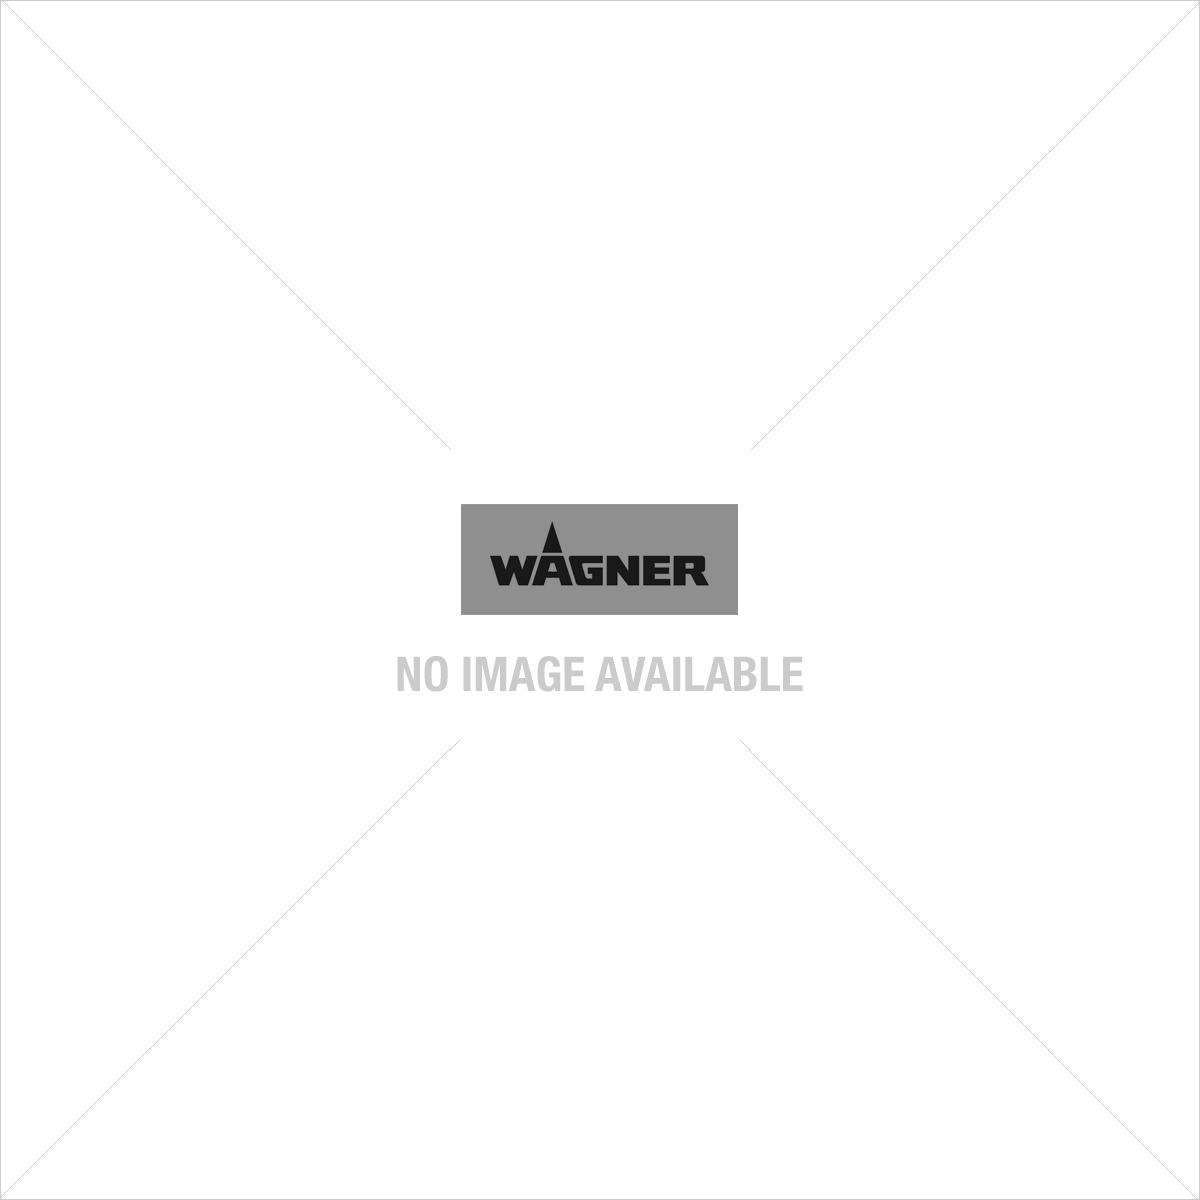 Feinsprühsystem Wagner Studio Home Decor Sprayer